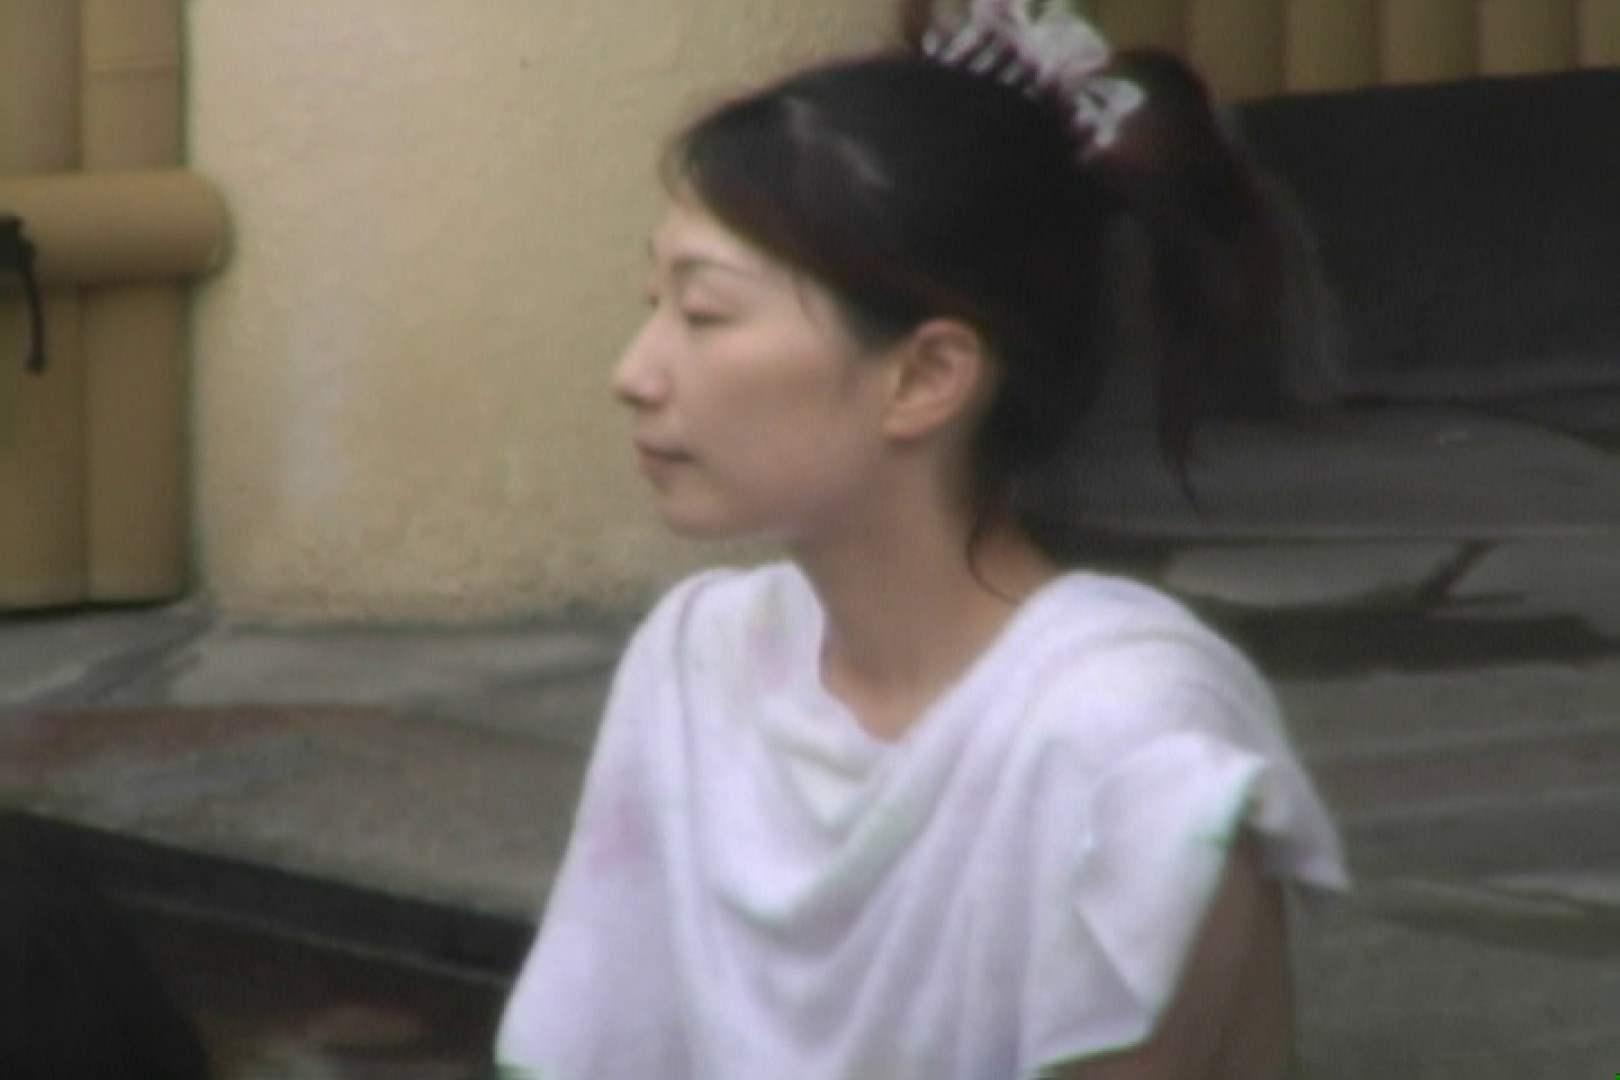 Aquaな露天風呂Vol.615 0  36連発 20